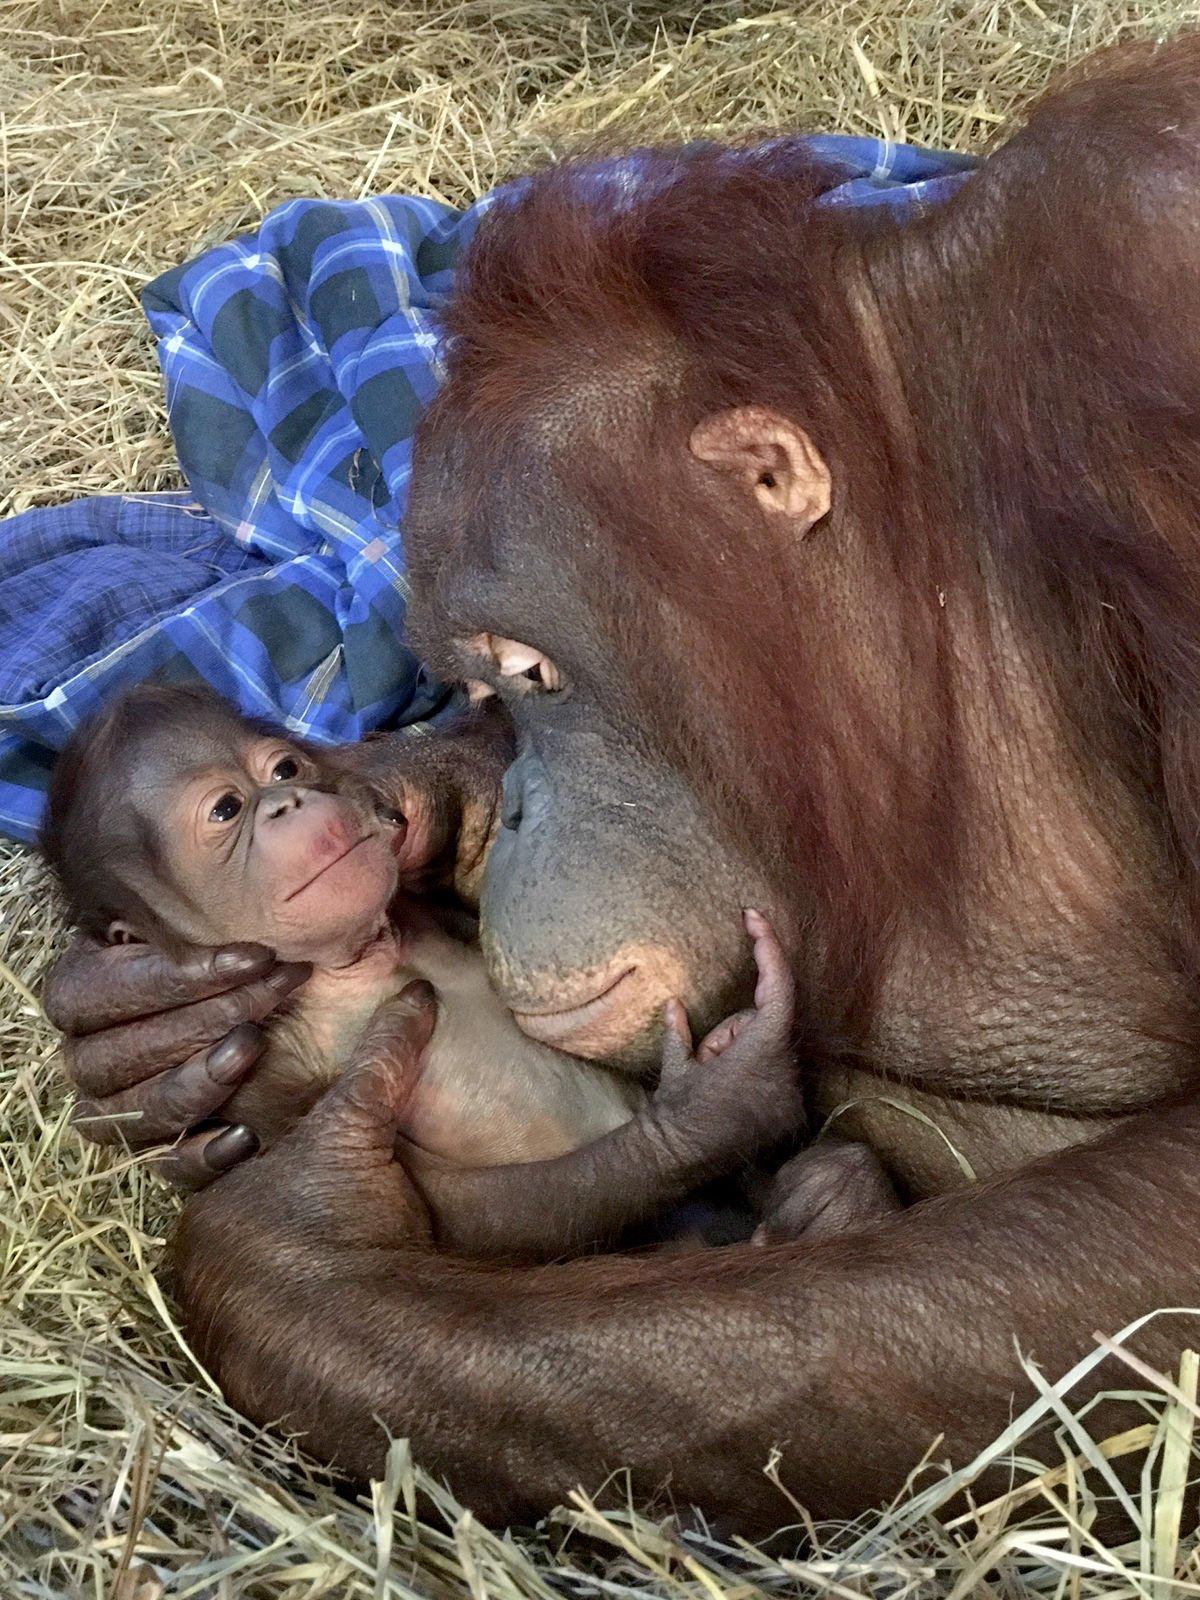 National Zoo's Redd is a furry ambassador for endangered orangutans